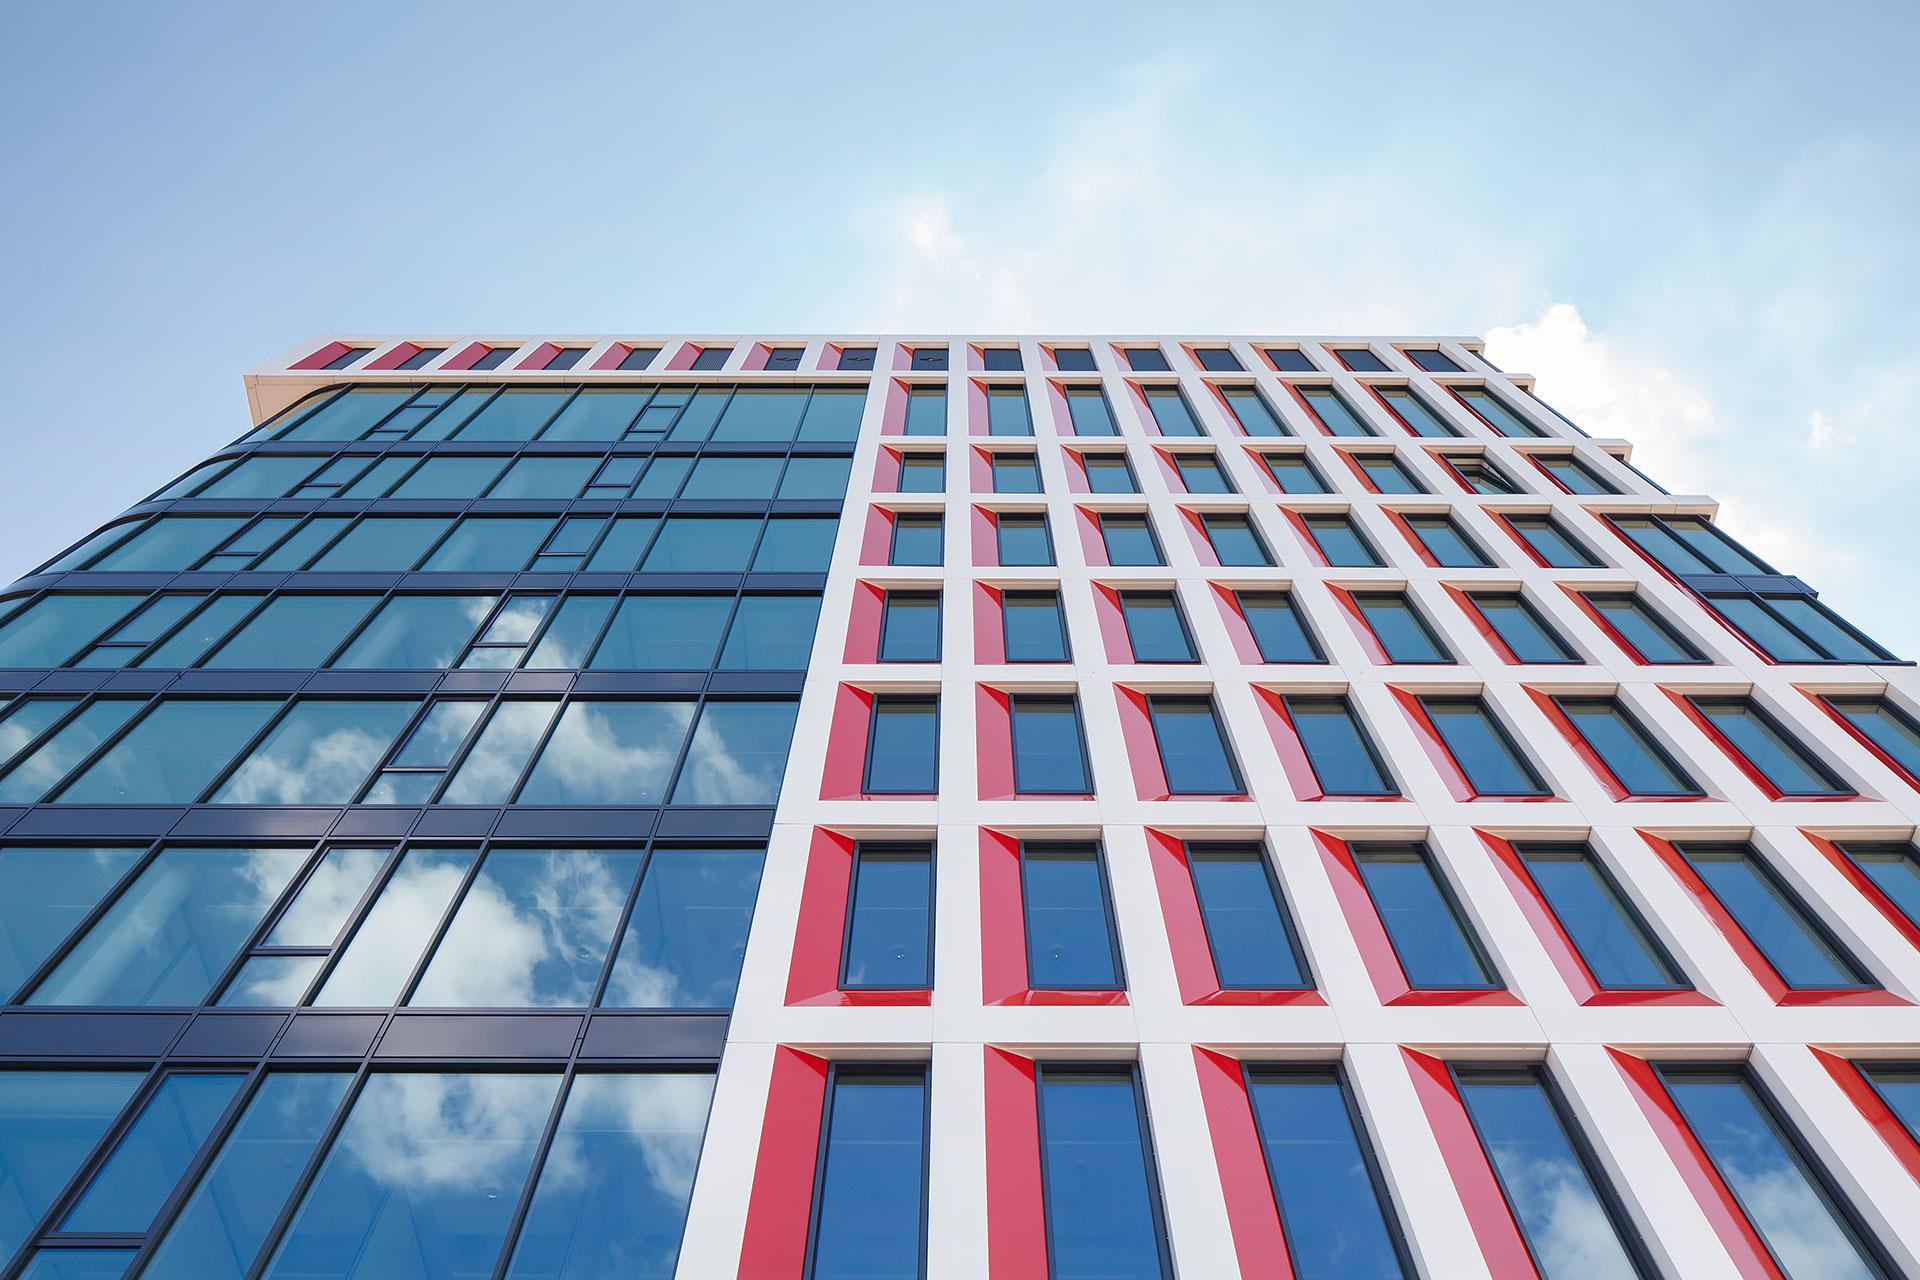 SP2015-Stadhuis-Almelo-architectuurfoto-07